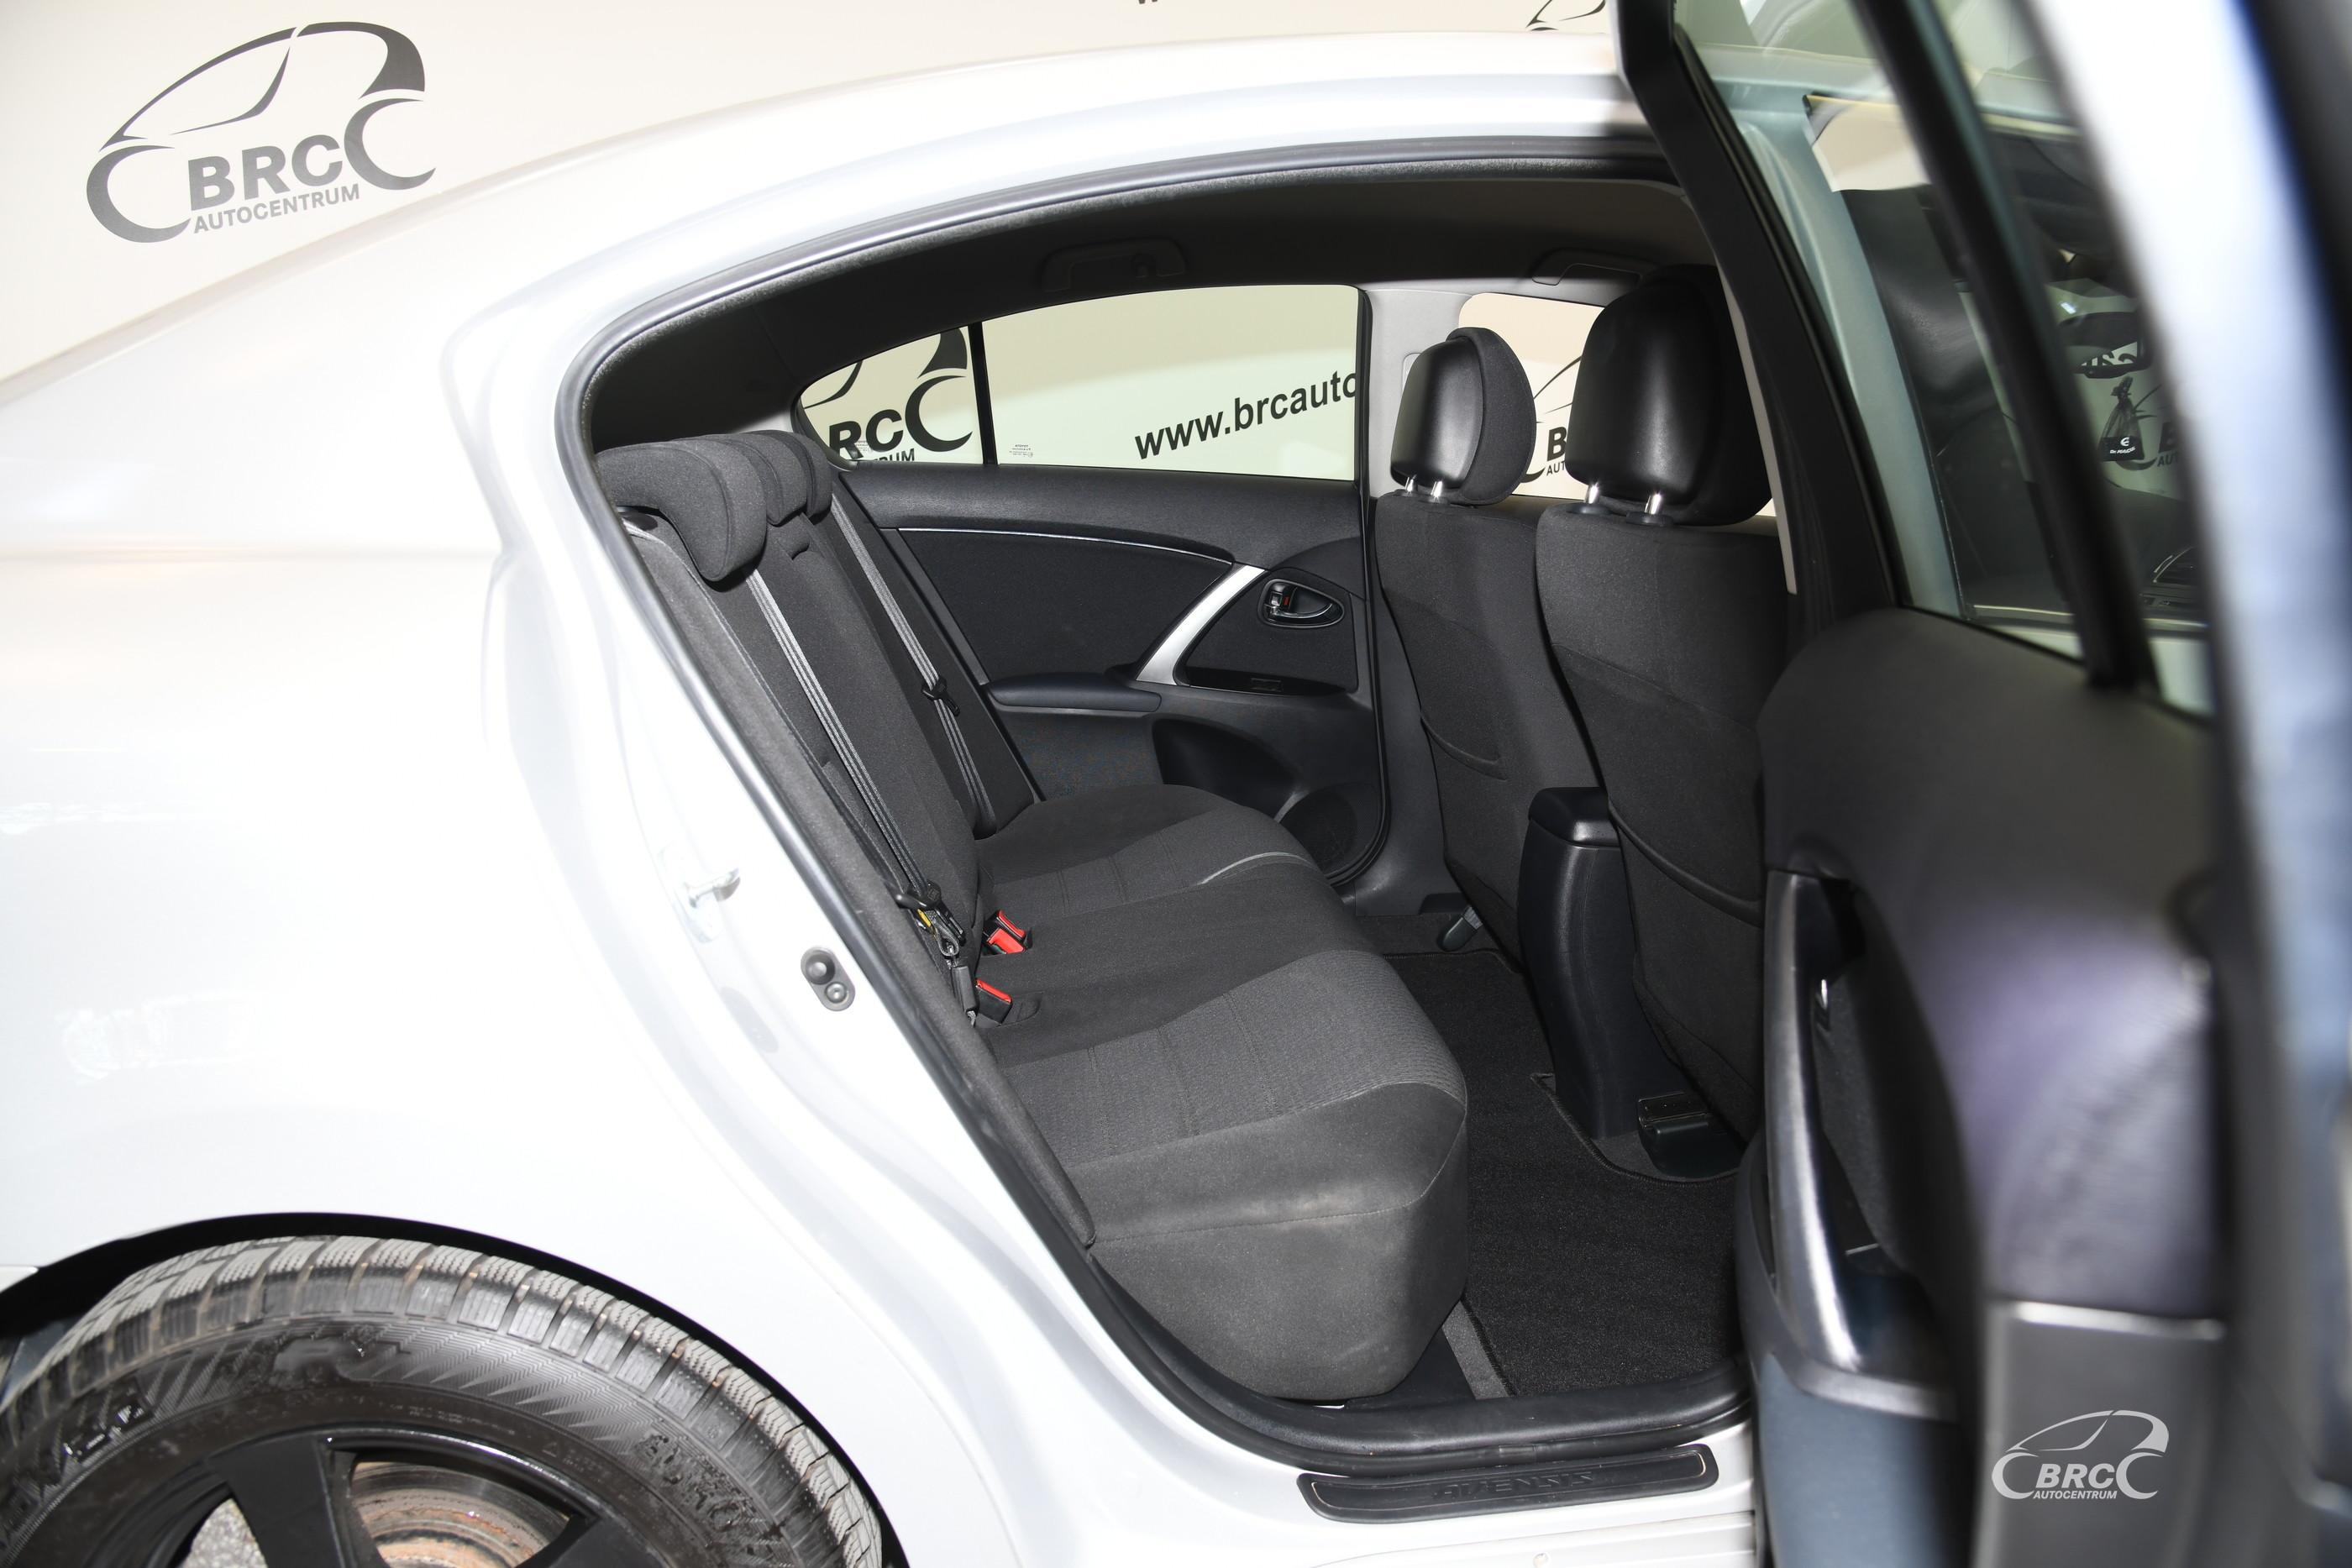 Toyota Avensis 1.8 VVT-i Linea Sol Automatas